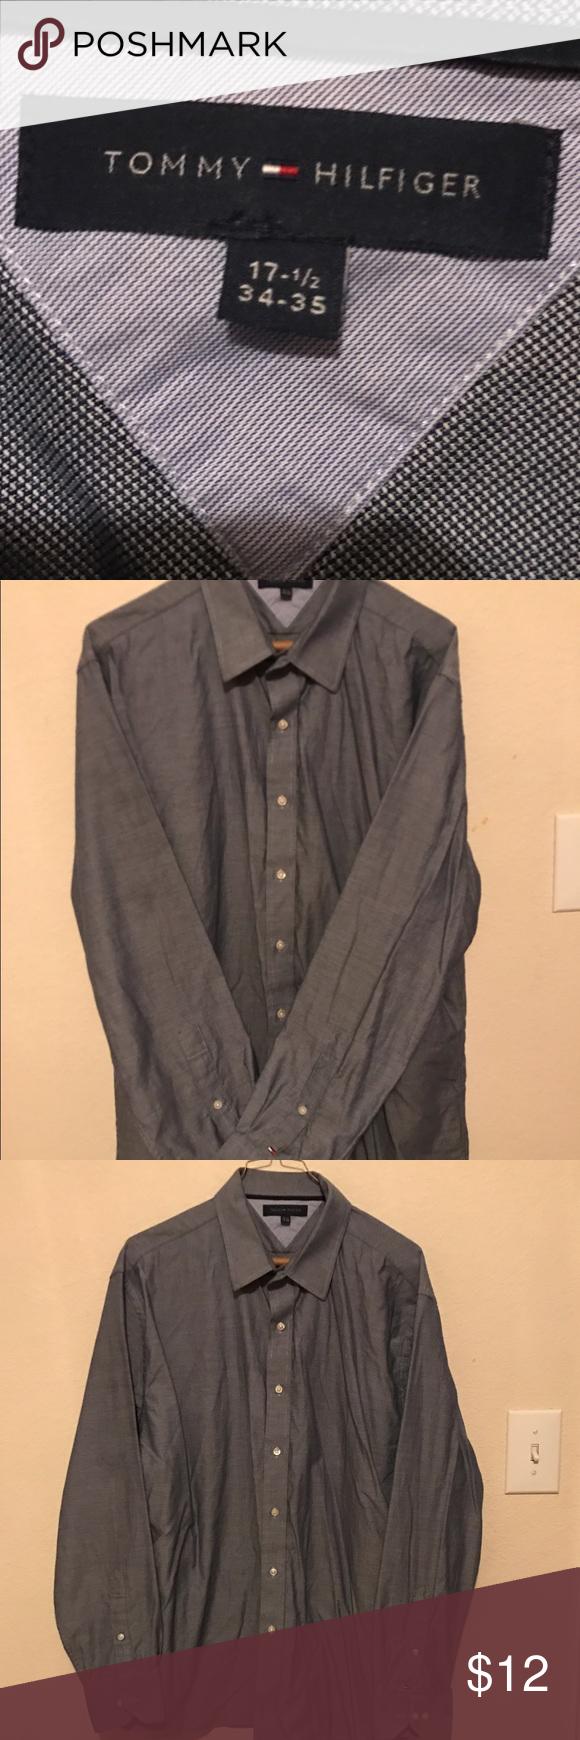 👔Tommy Hilfiger👔 Men's shirt. Excellent condition just wrinkled. Tommy Hilfiger Shirts Dress Shirts